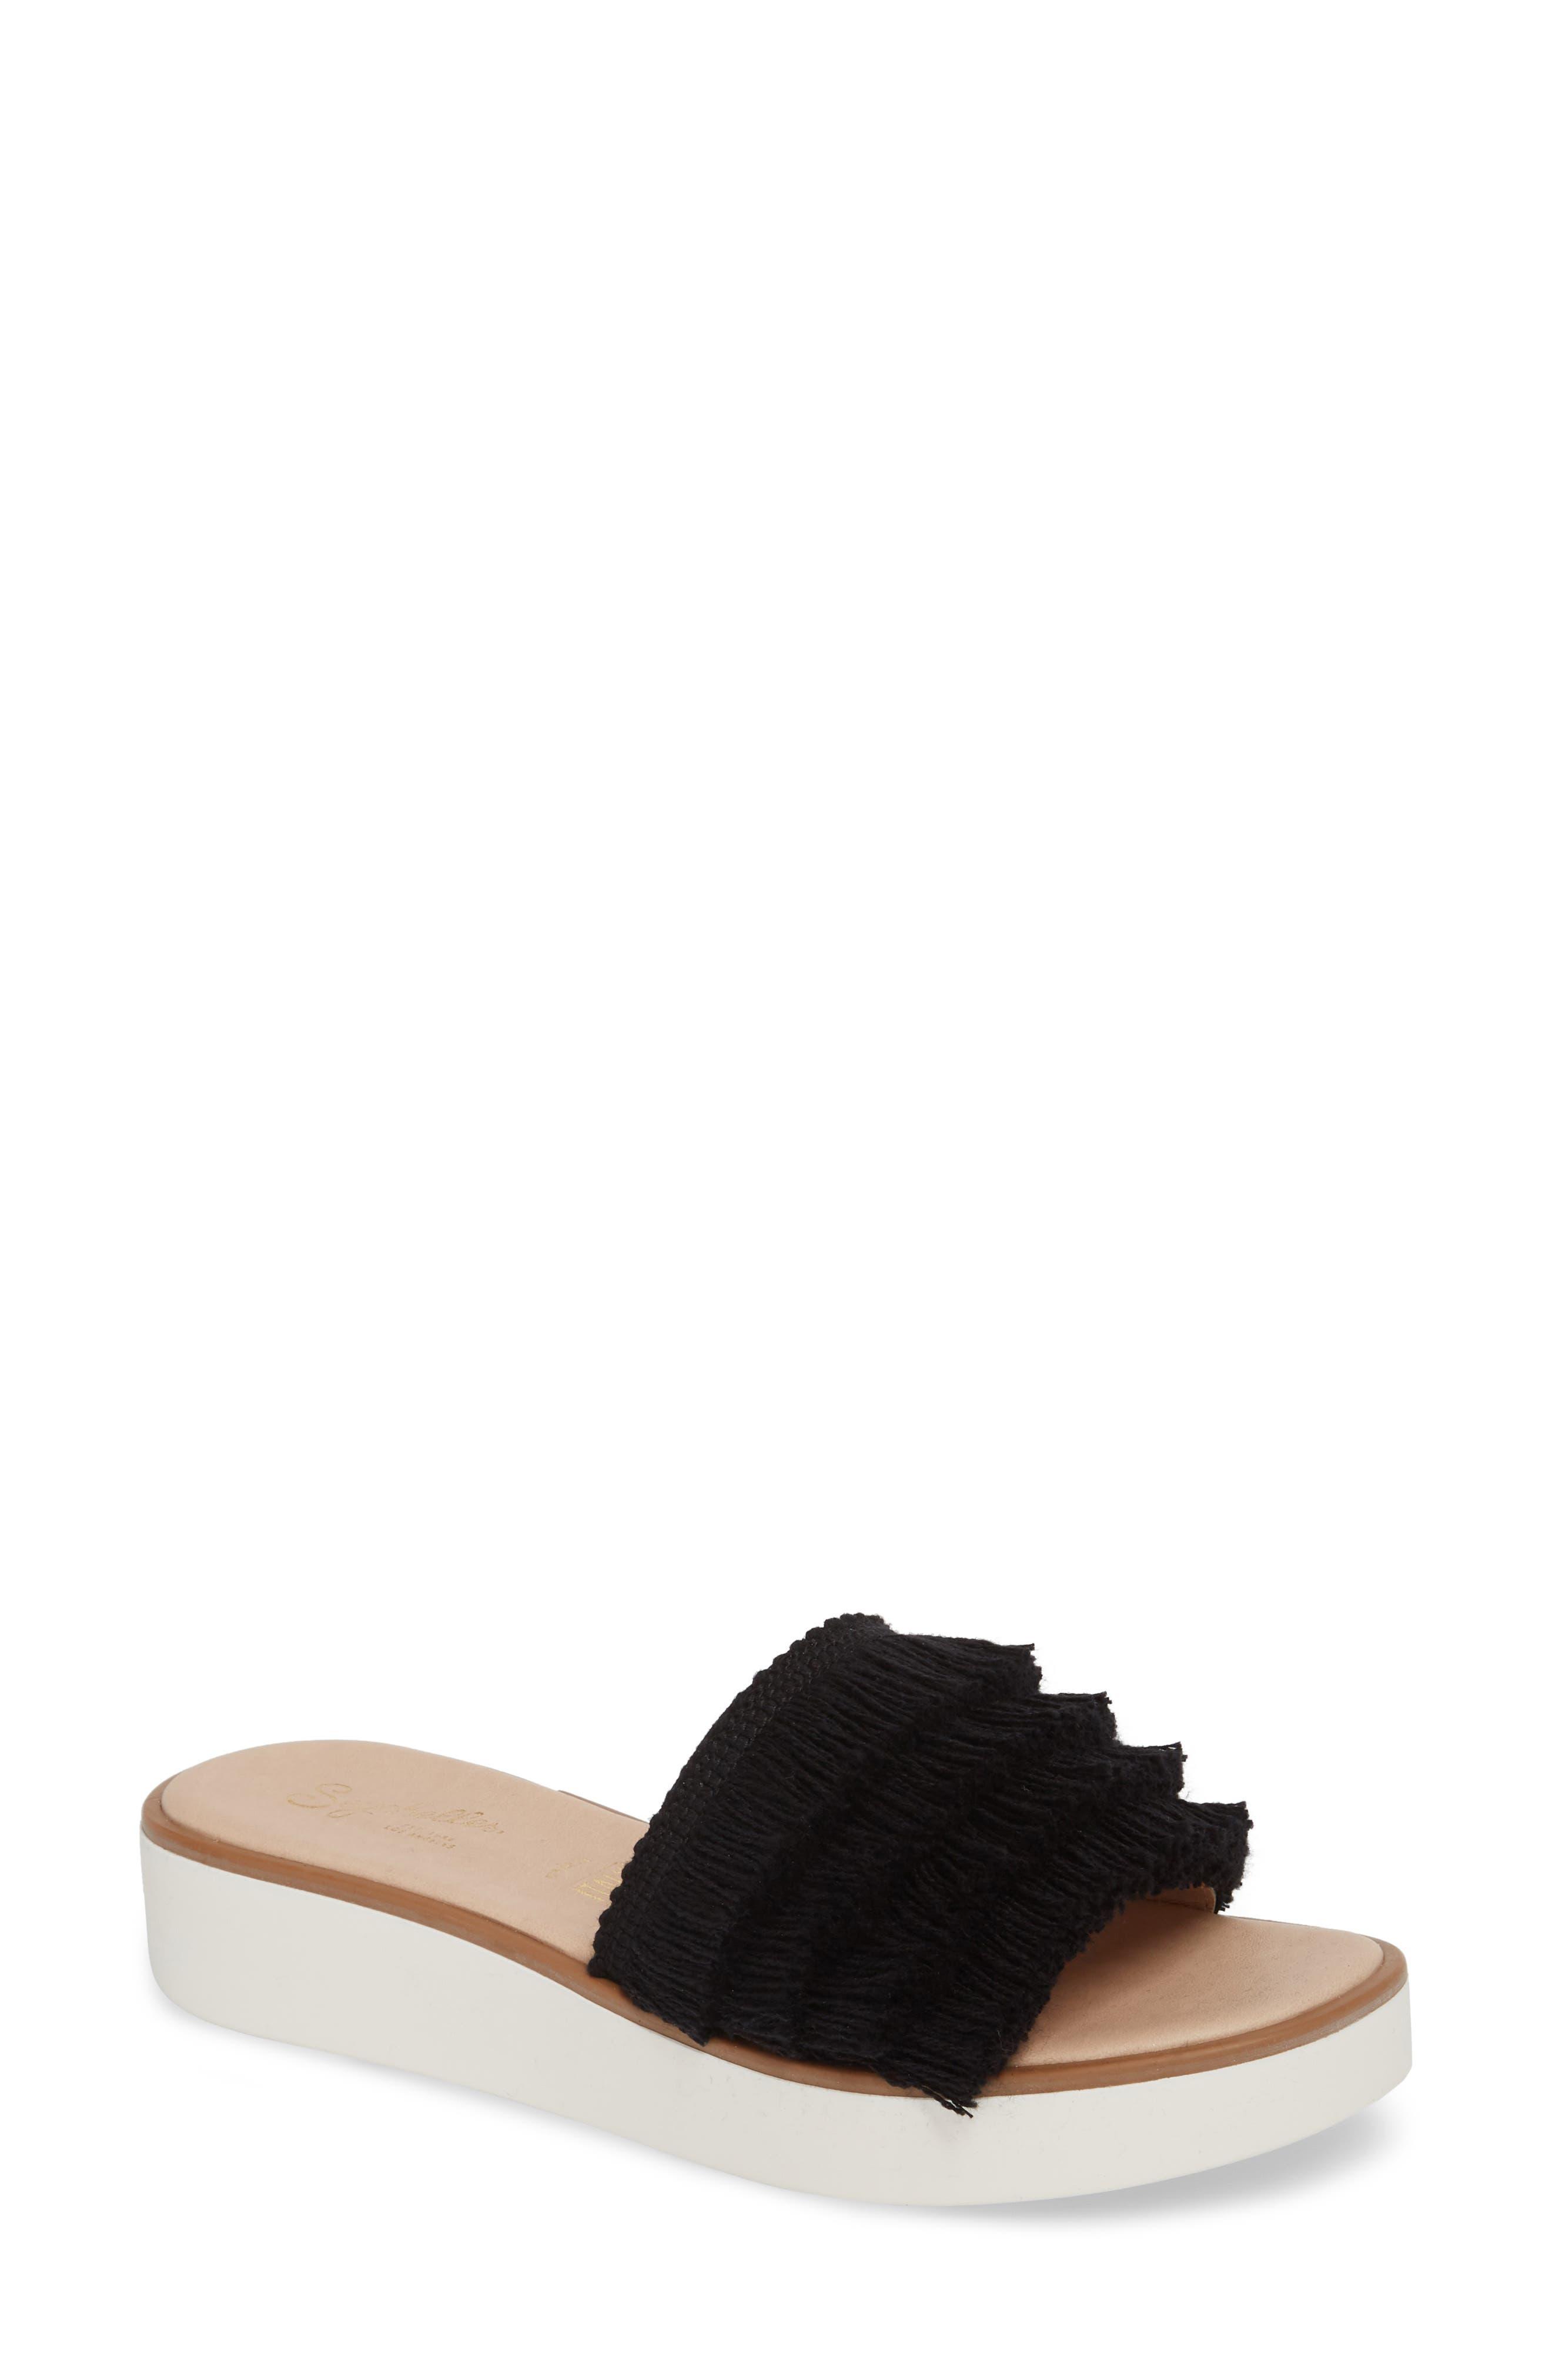 Well Rested Ruffle Slide Sandal,                             Main thumbnail 1, color,                             Black Fabric